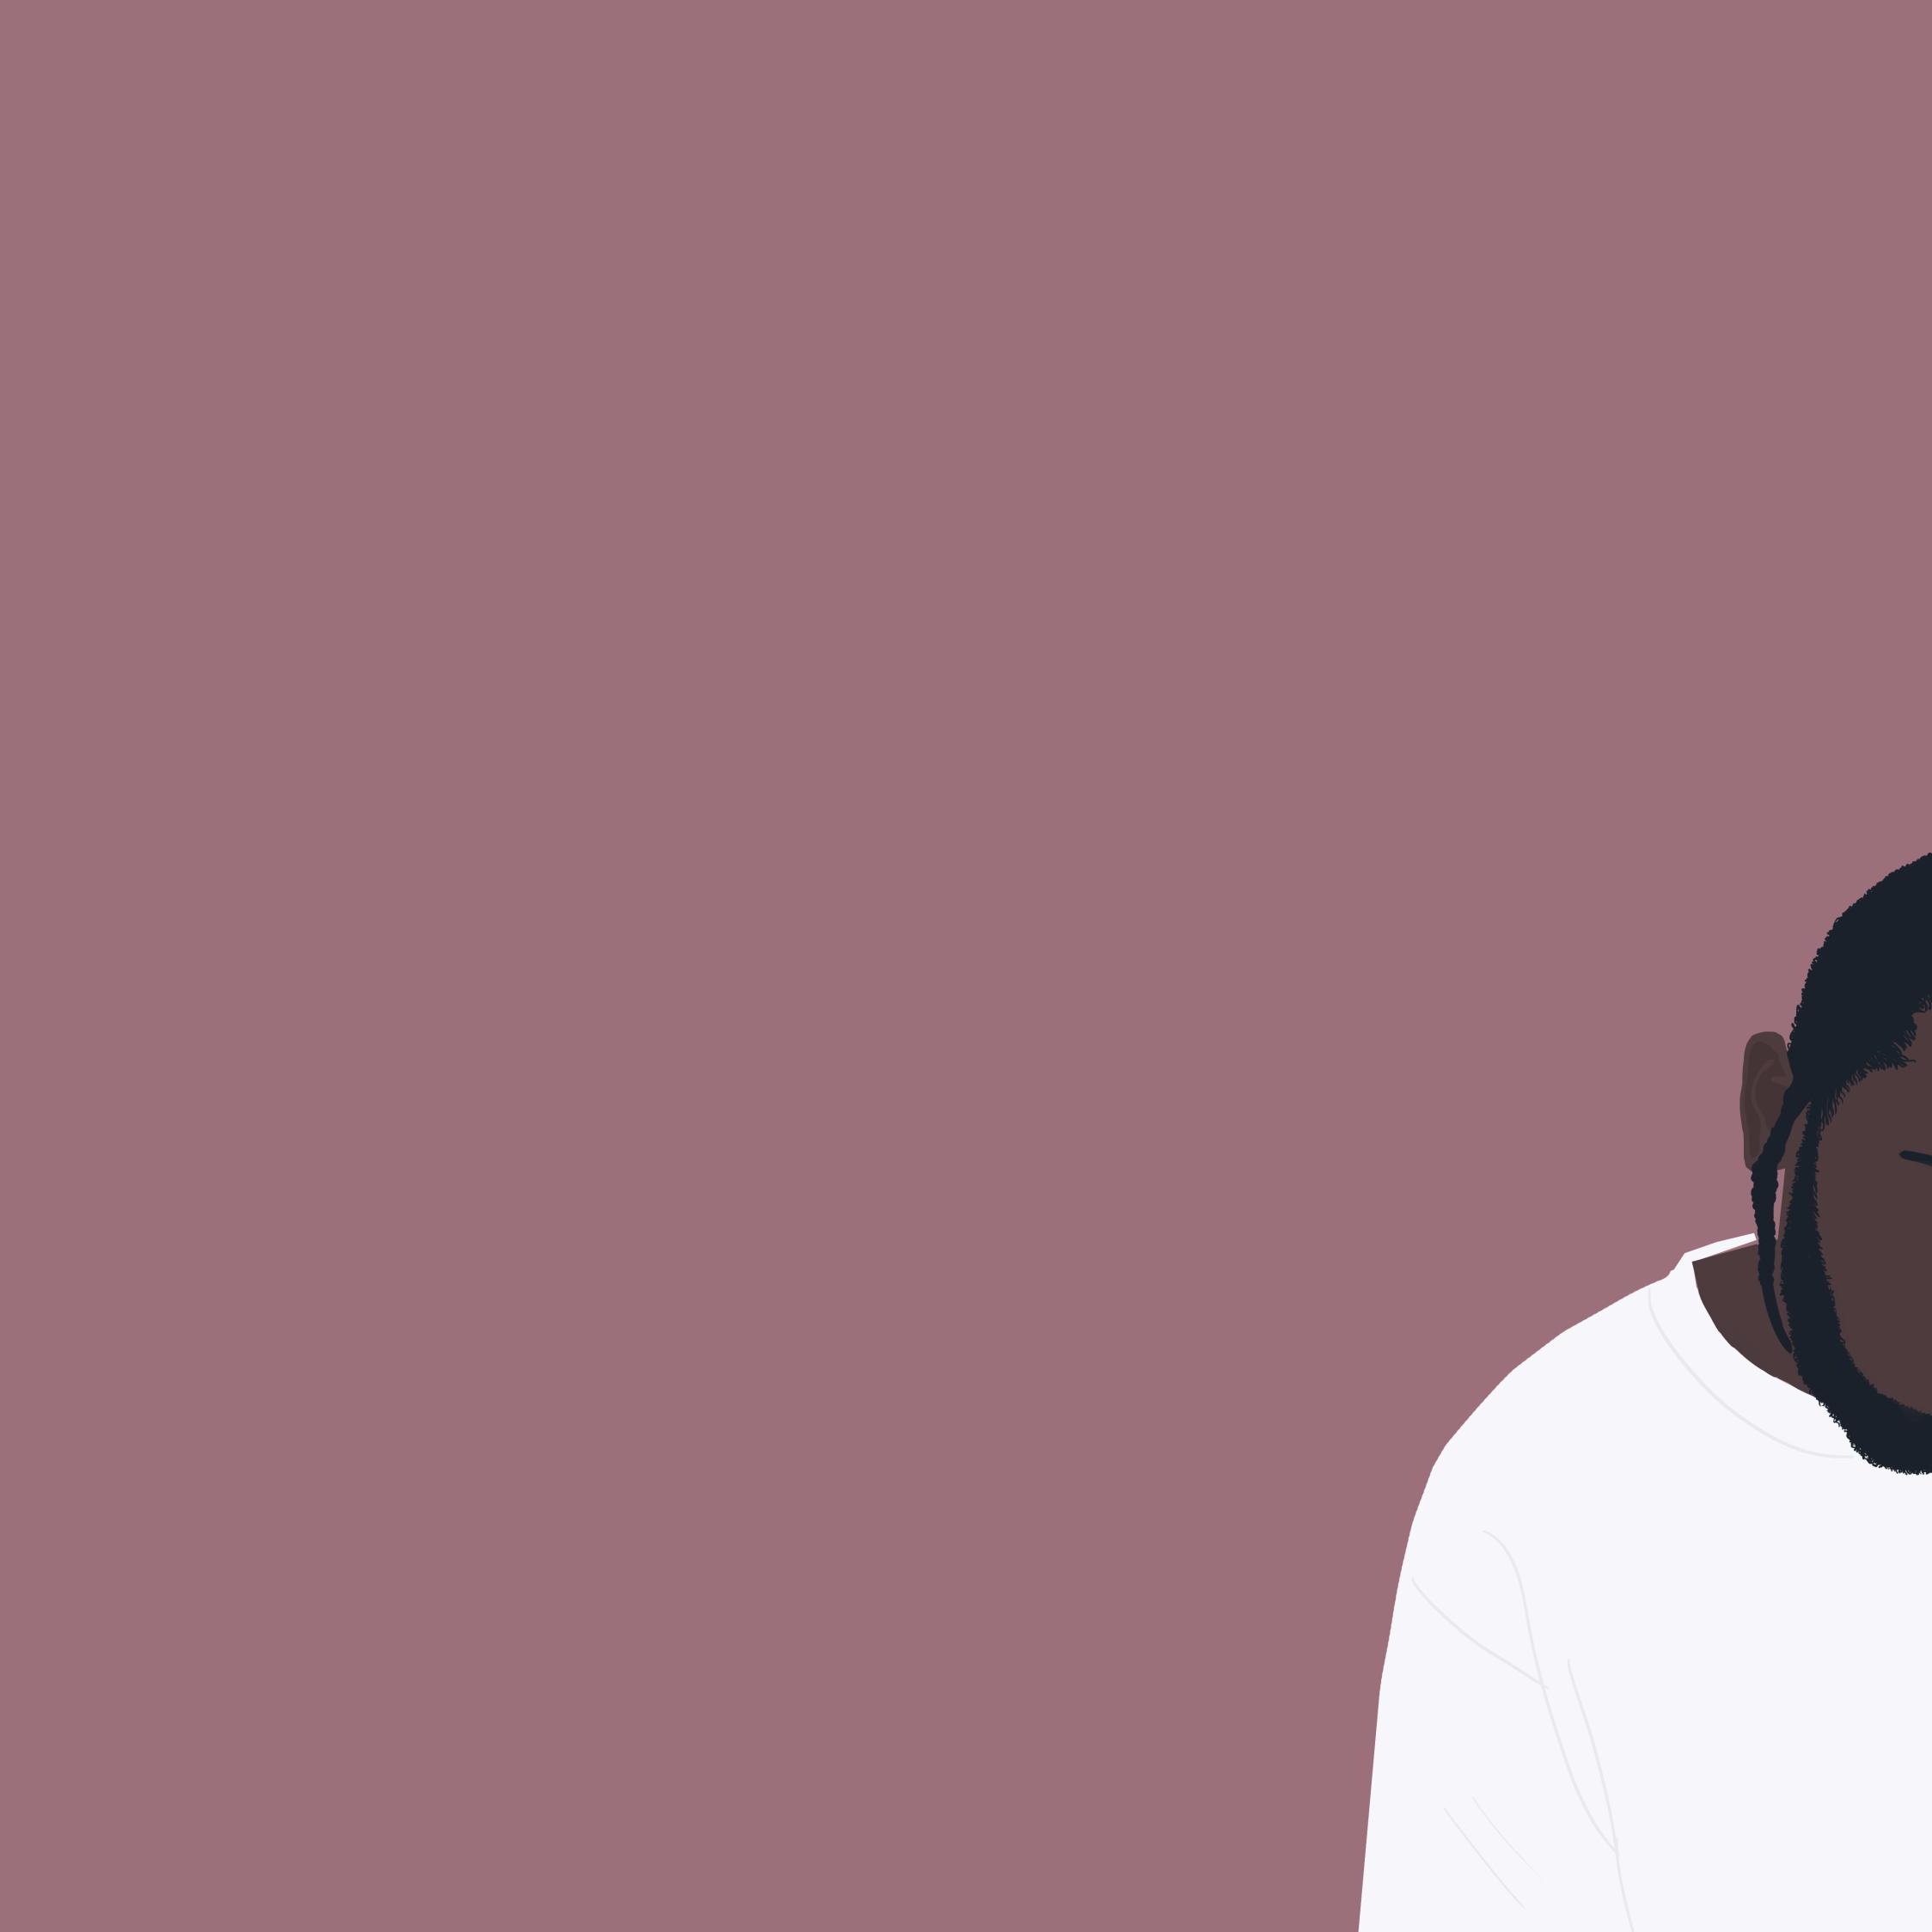 Kendrick Lamar Minimal, HD 8K Wallpaper